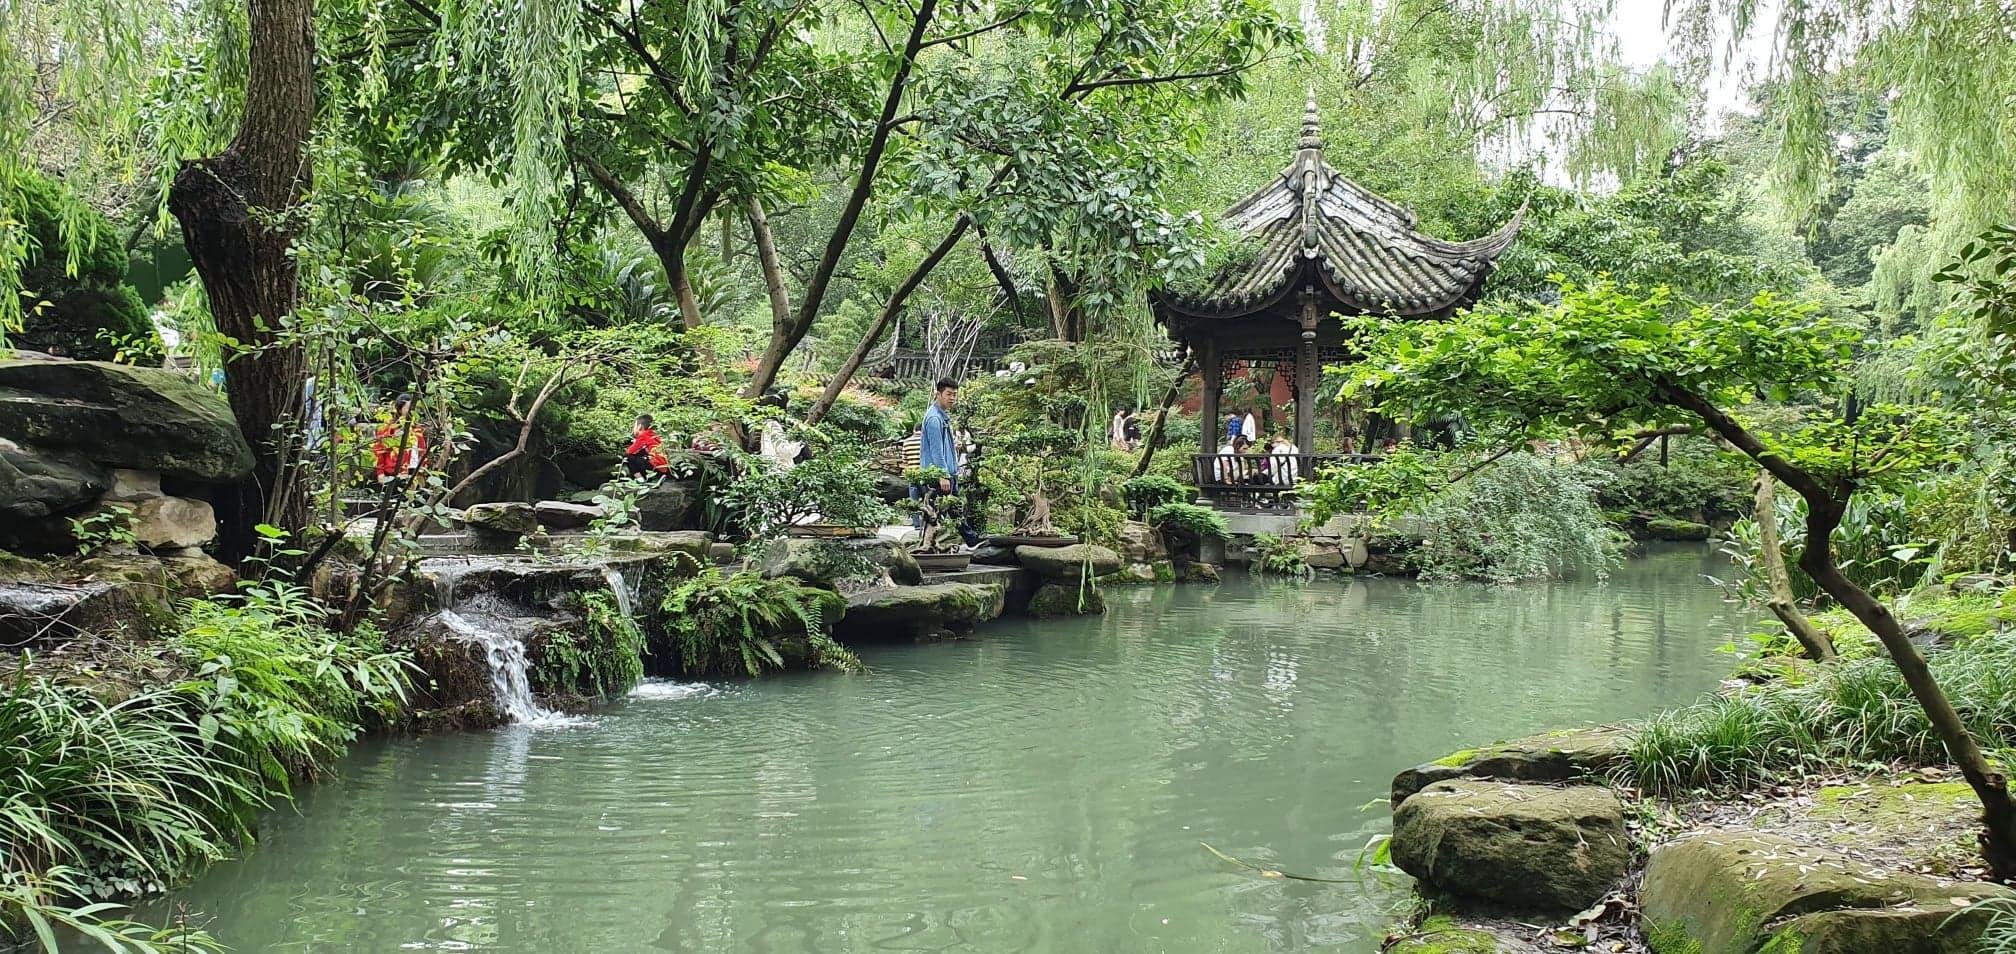 Choosing Chengdu – Insights From Hamer Scholar Jason Cheetham